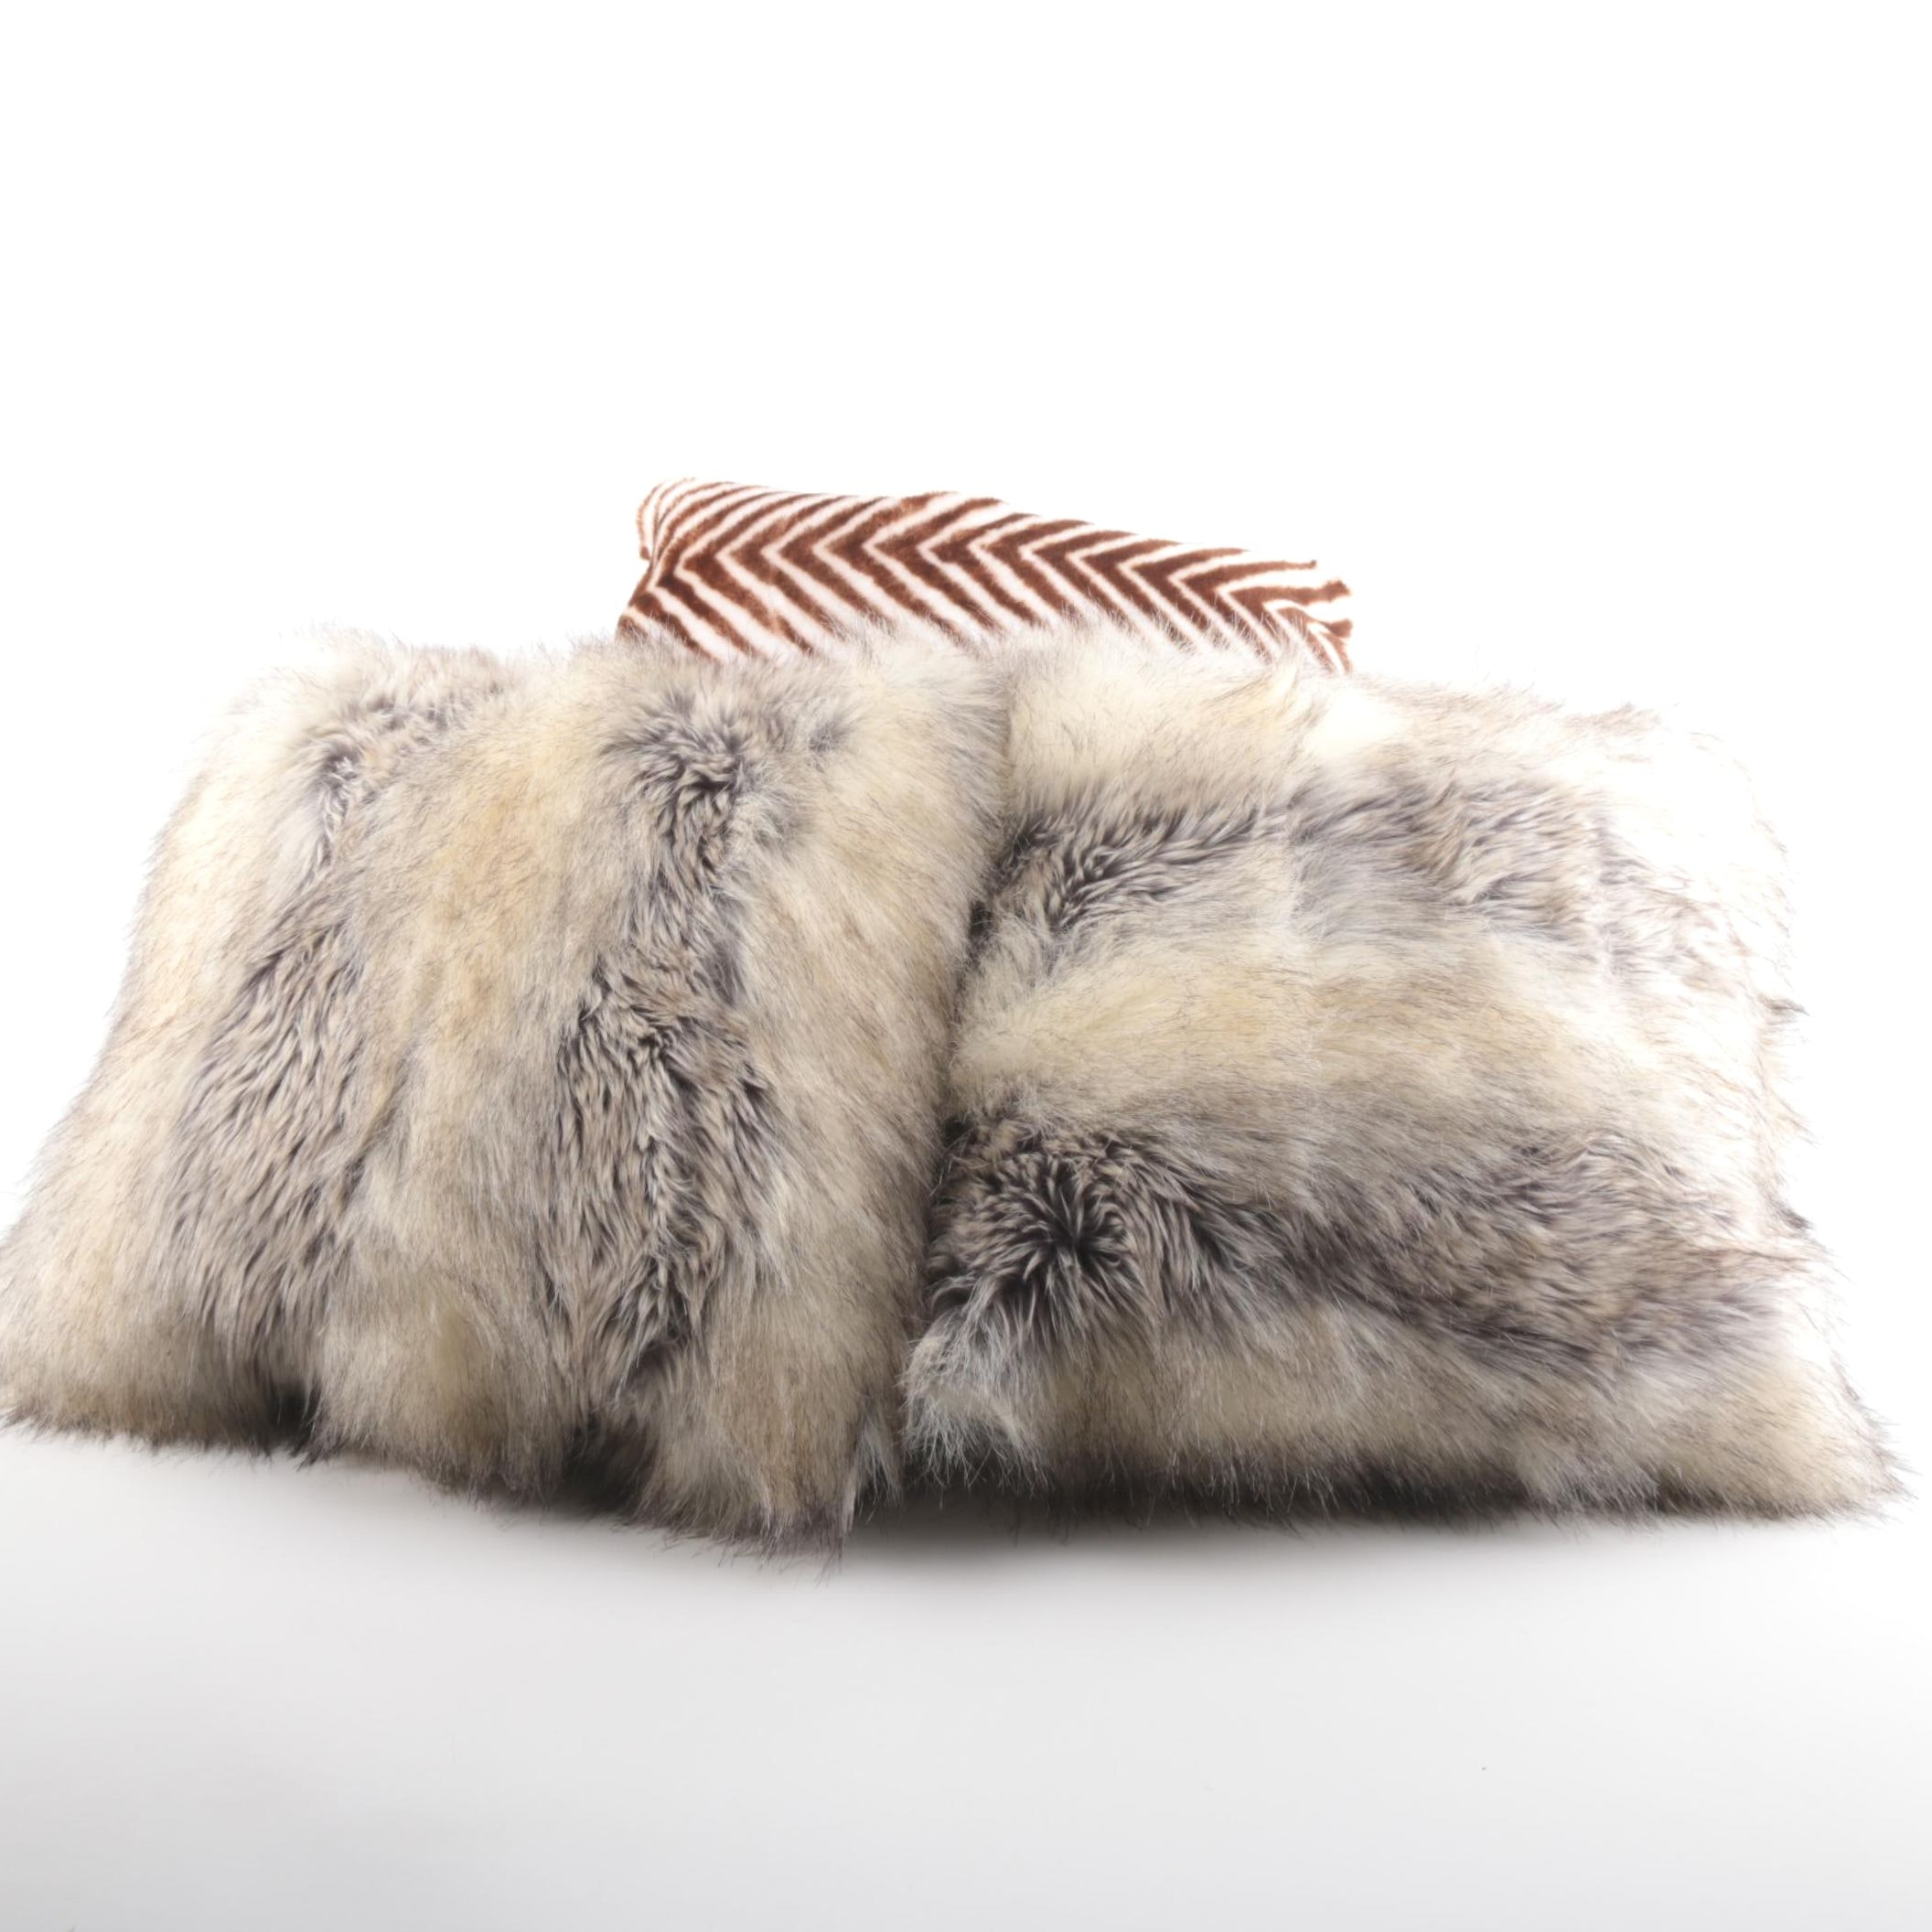 Faux Animal Fur Pillows